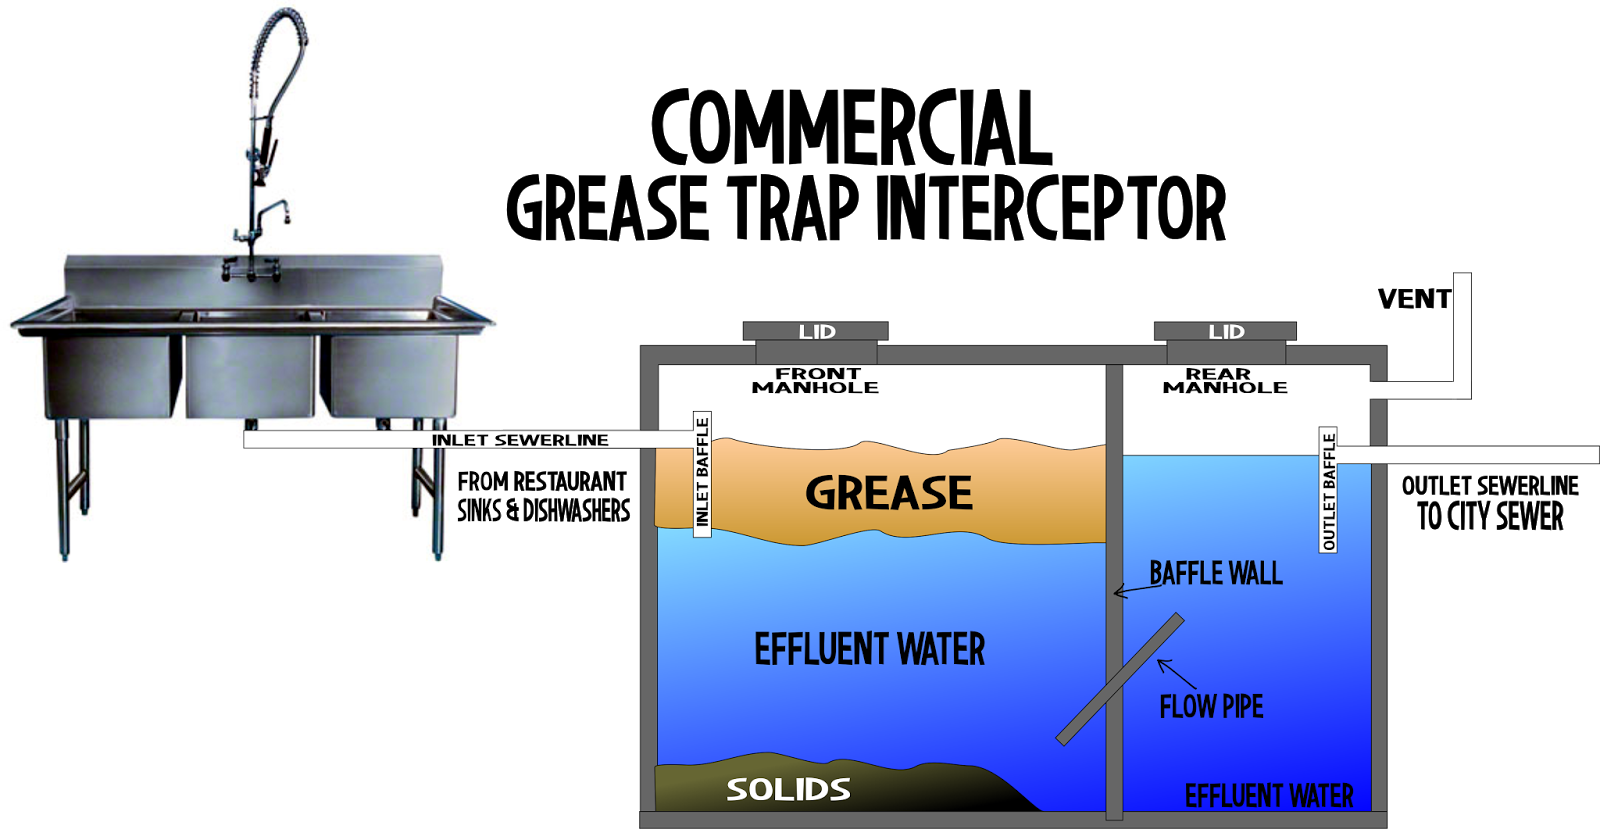 Grease trap diagram images interceptor